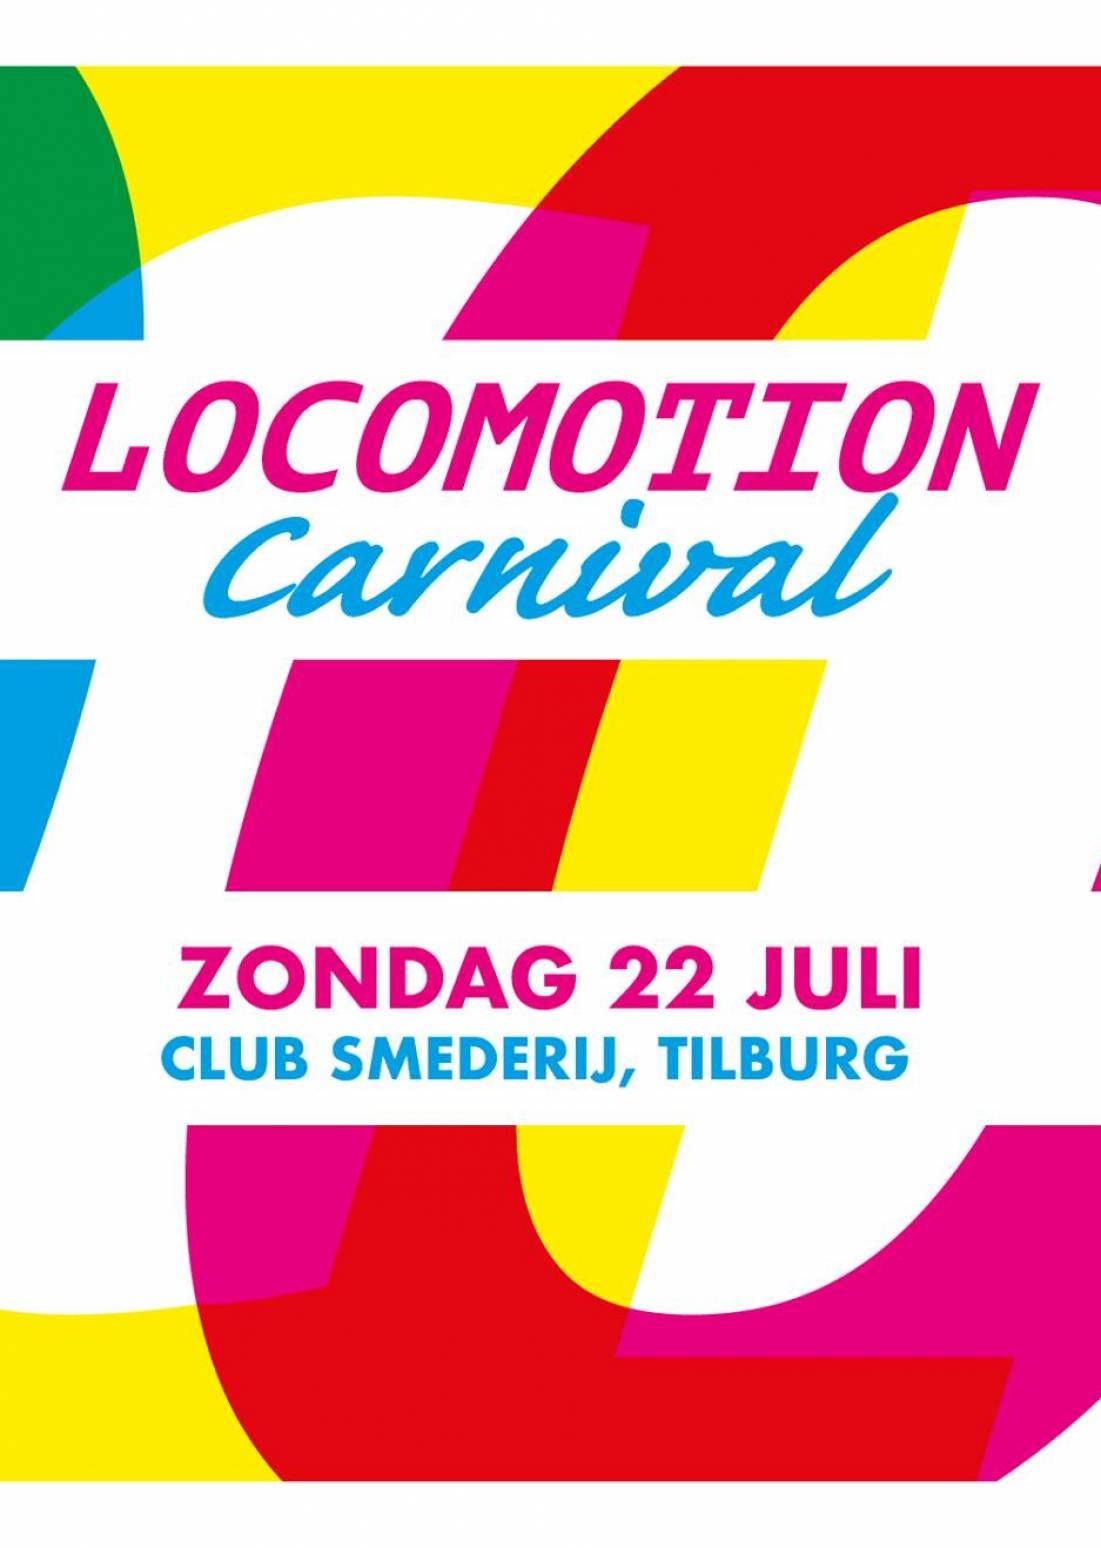 Locomotion Carnival x Club Smederij